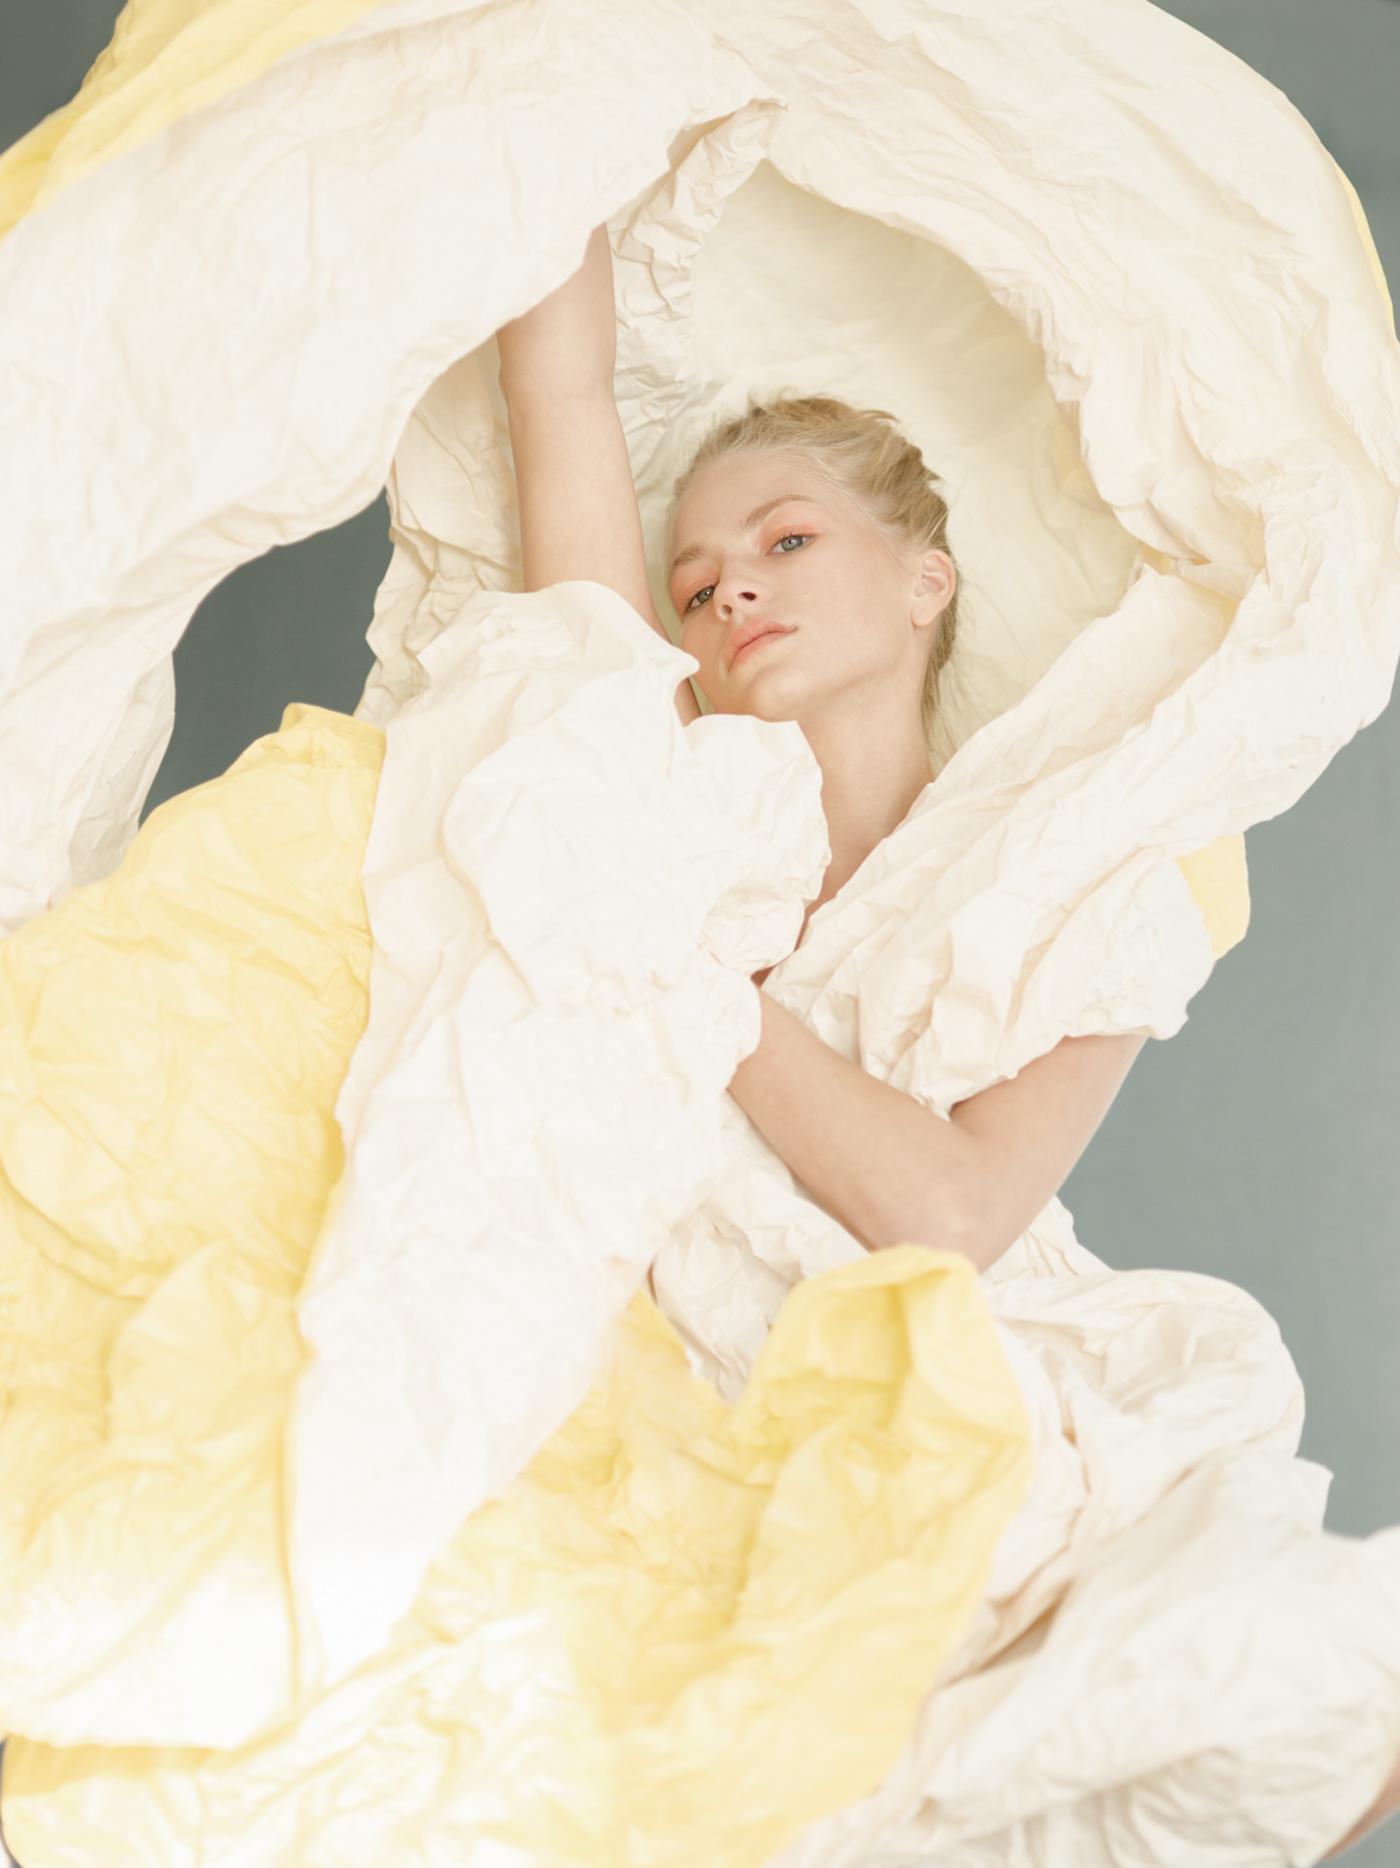 Fragilité - фотограф Elena Iv-skaya модель Sarah Akrour